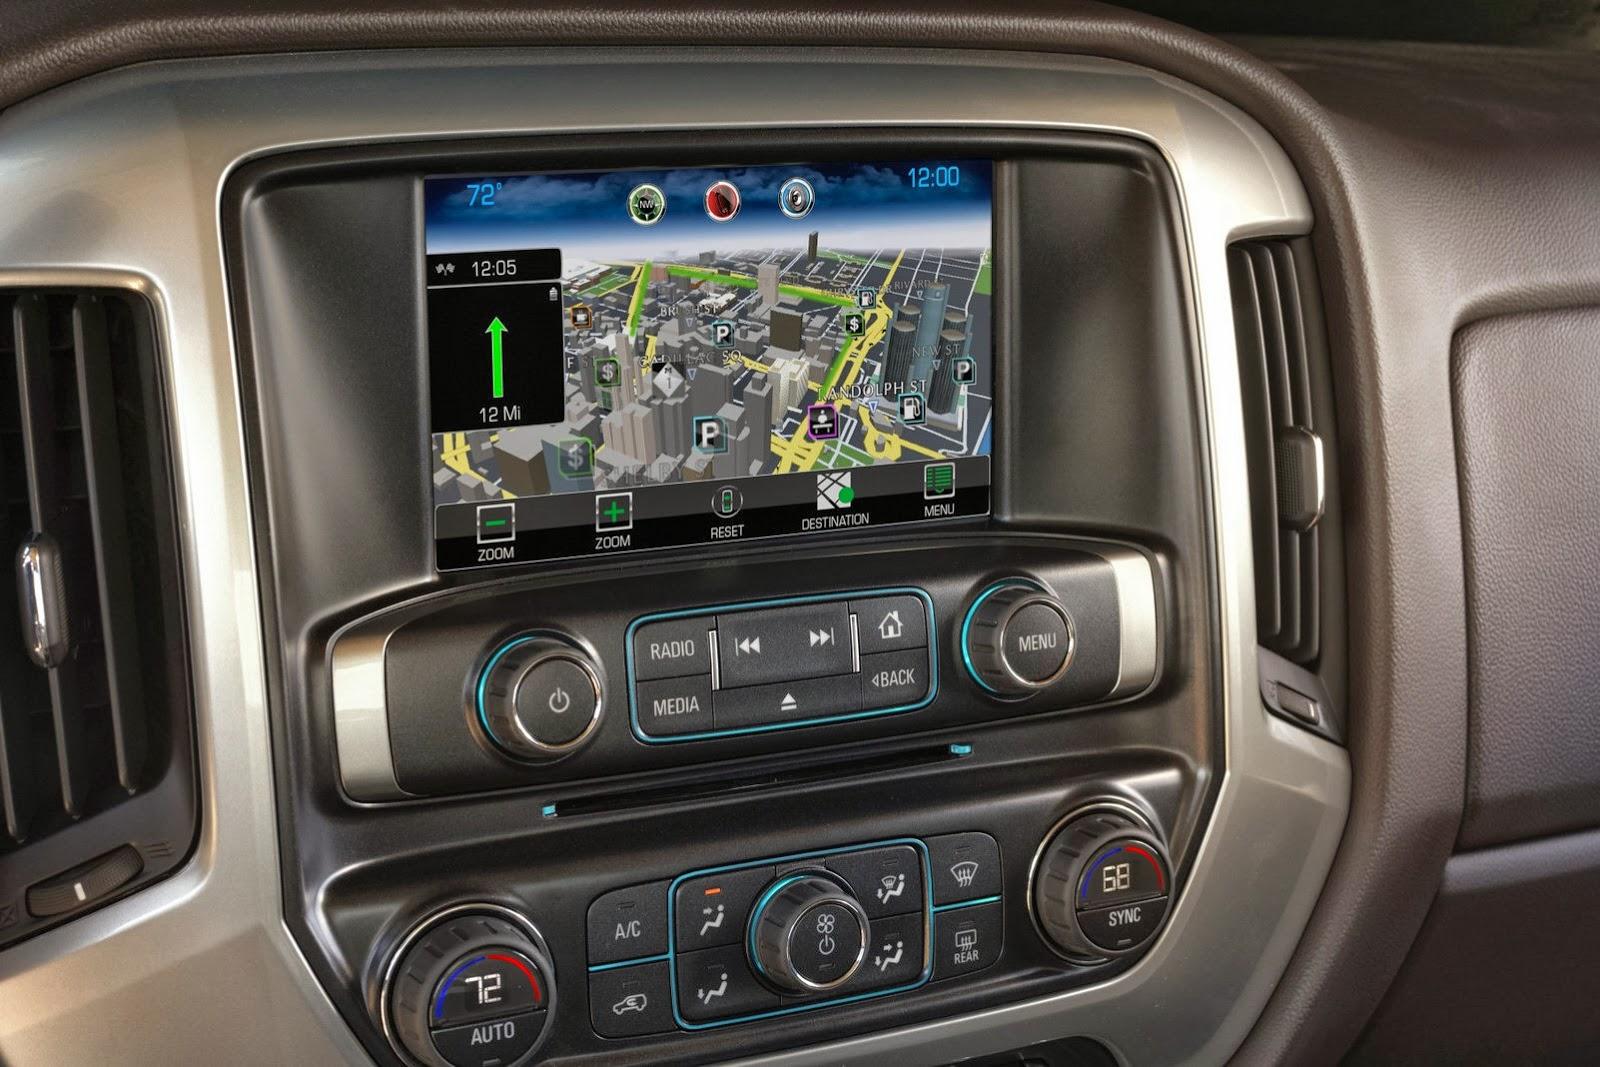 2015-Chevrolet-Silverado-3500-HD-19%25255B2%25255D.jpg